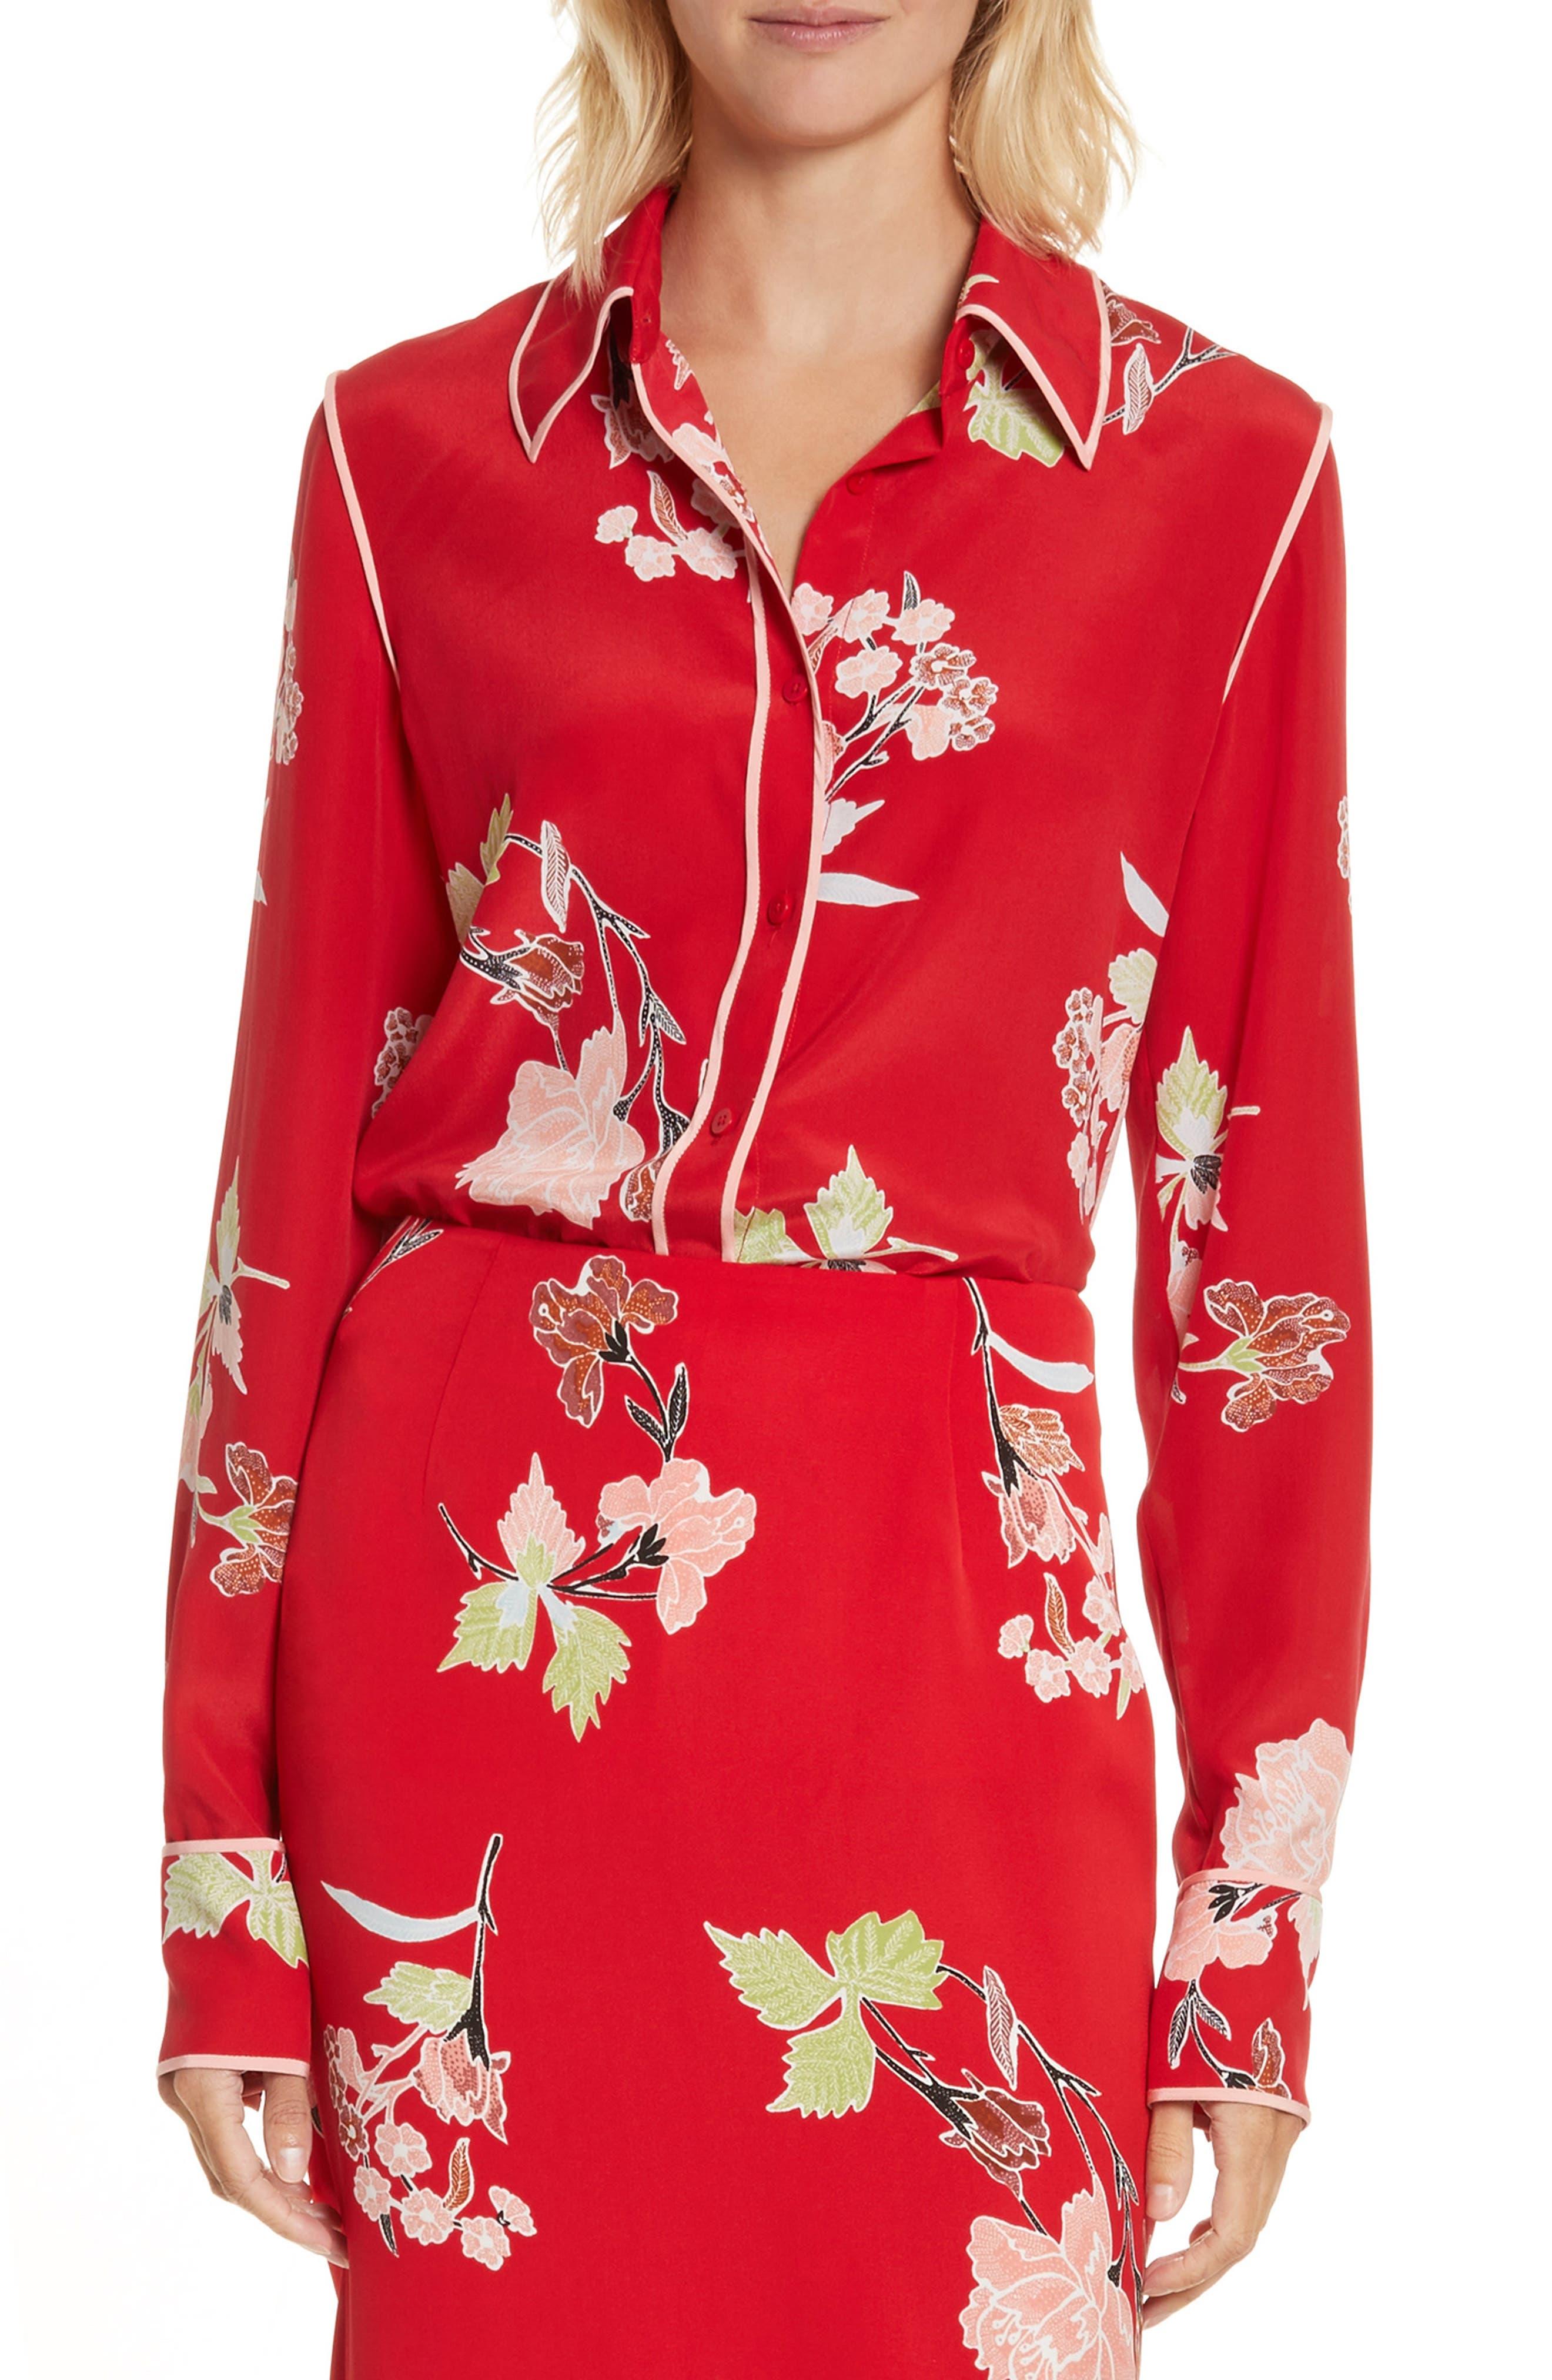 Alternate Image 1 Selected - Diane von Furstenberg Floral Print Silk Shirt